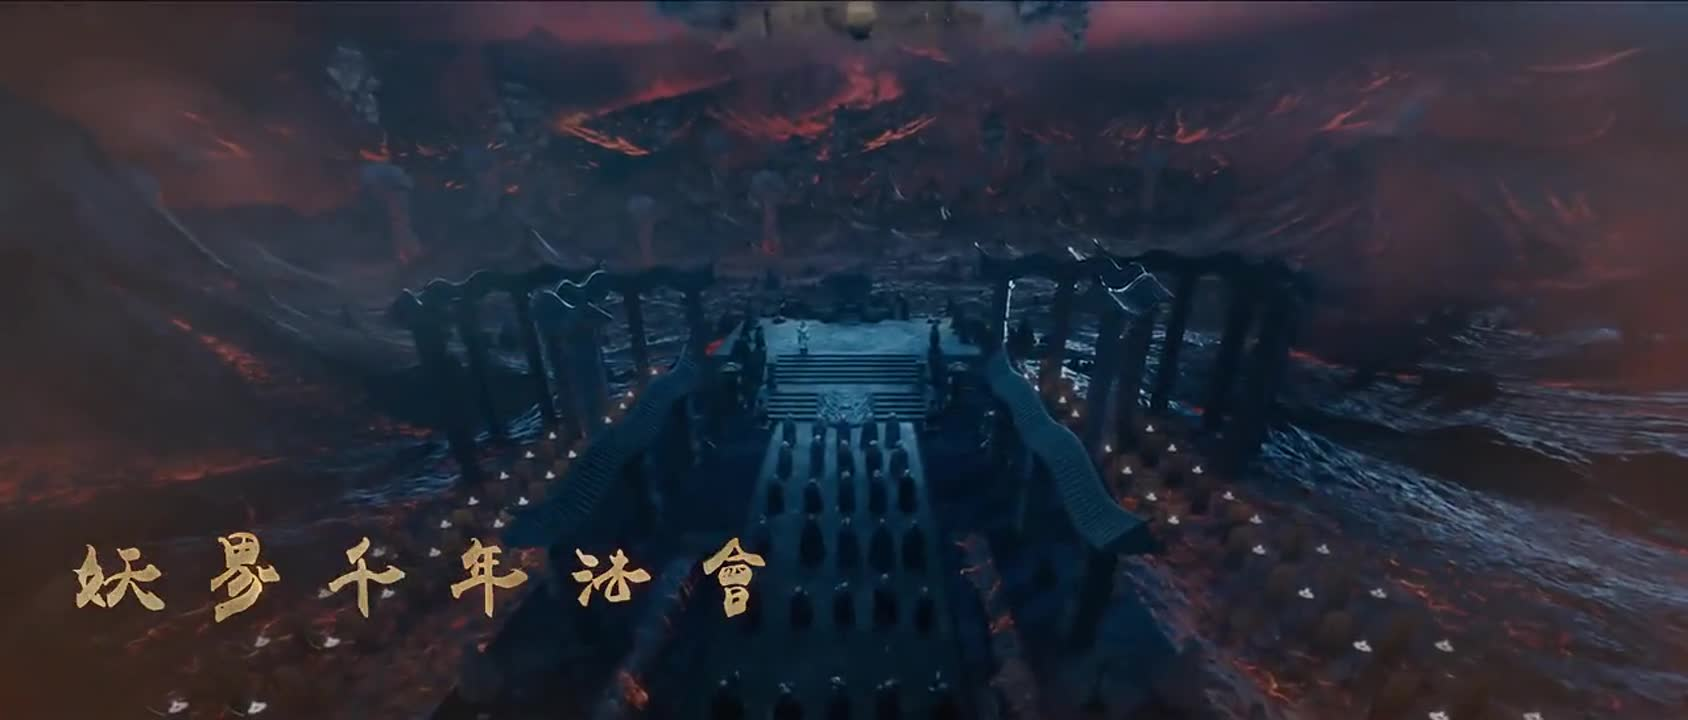 Six Strange Tales of Liao Zhai (2020)